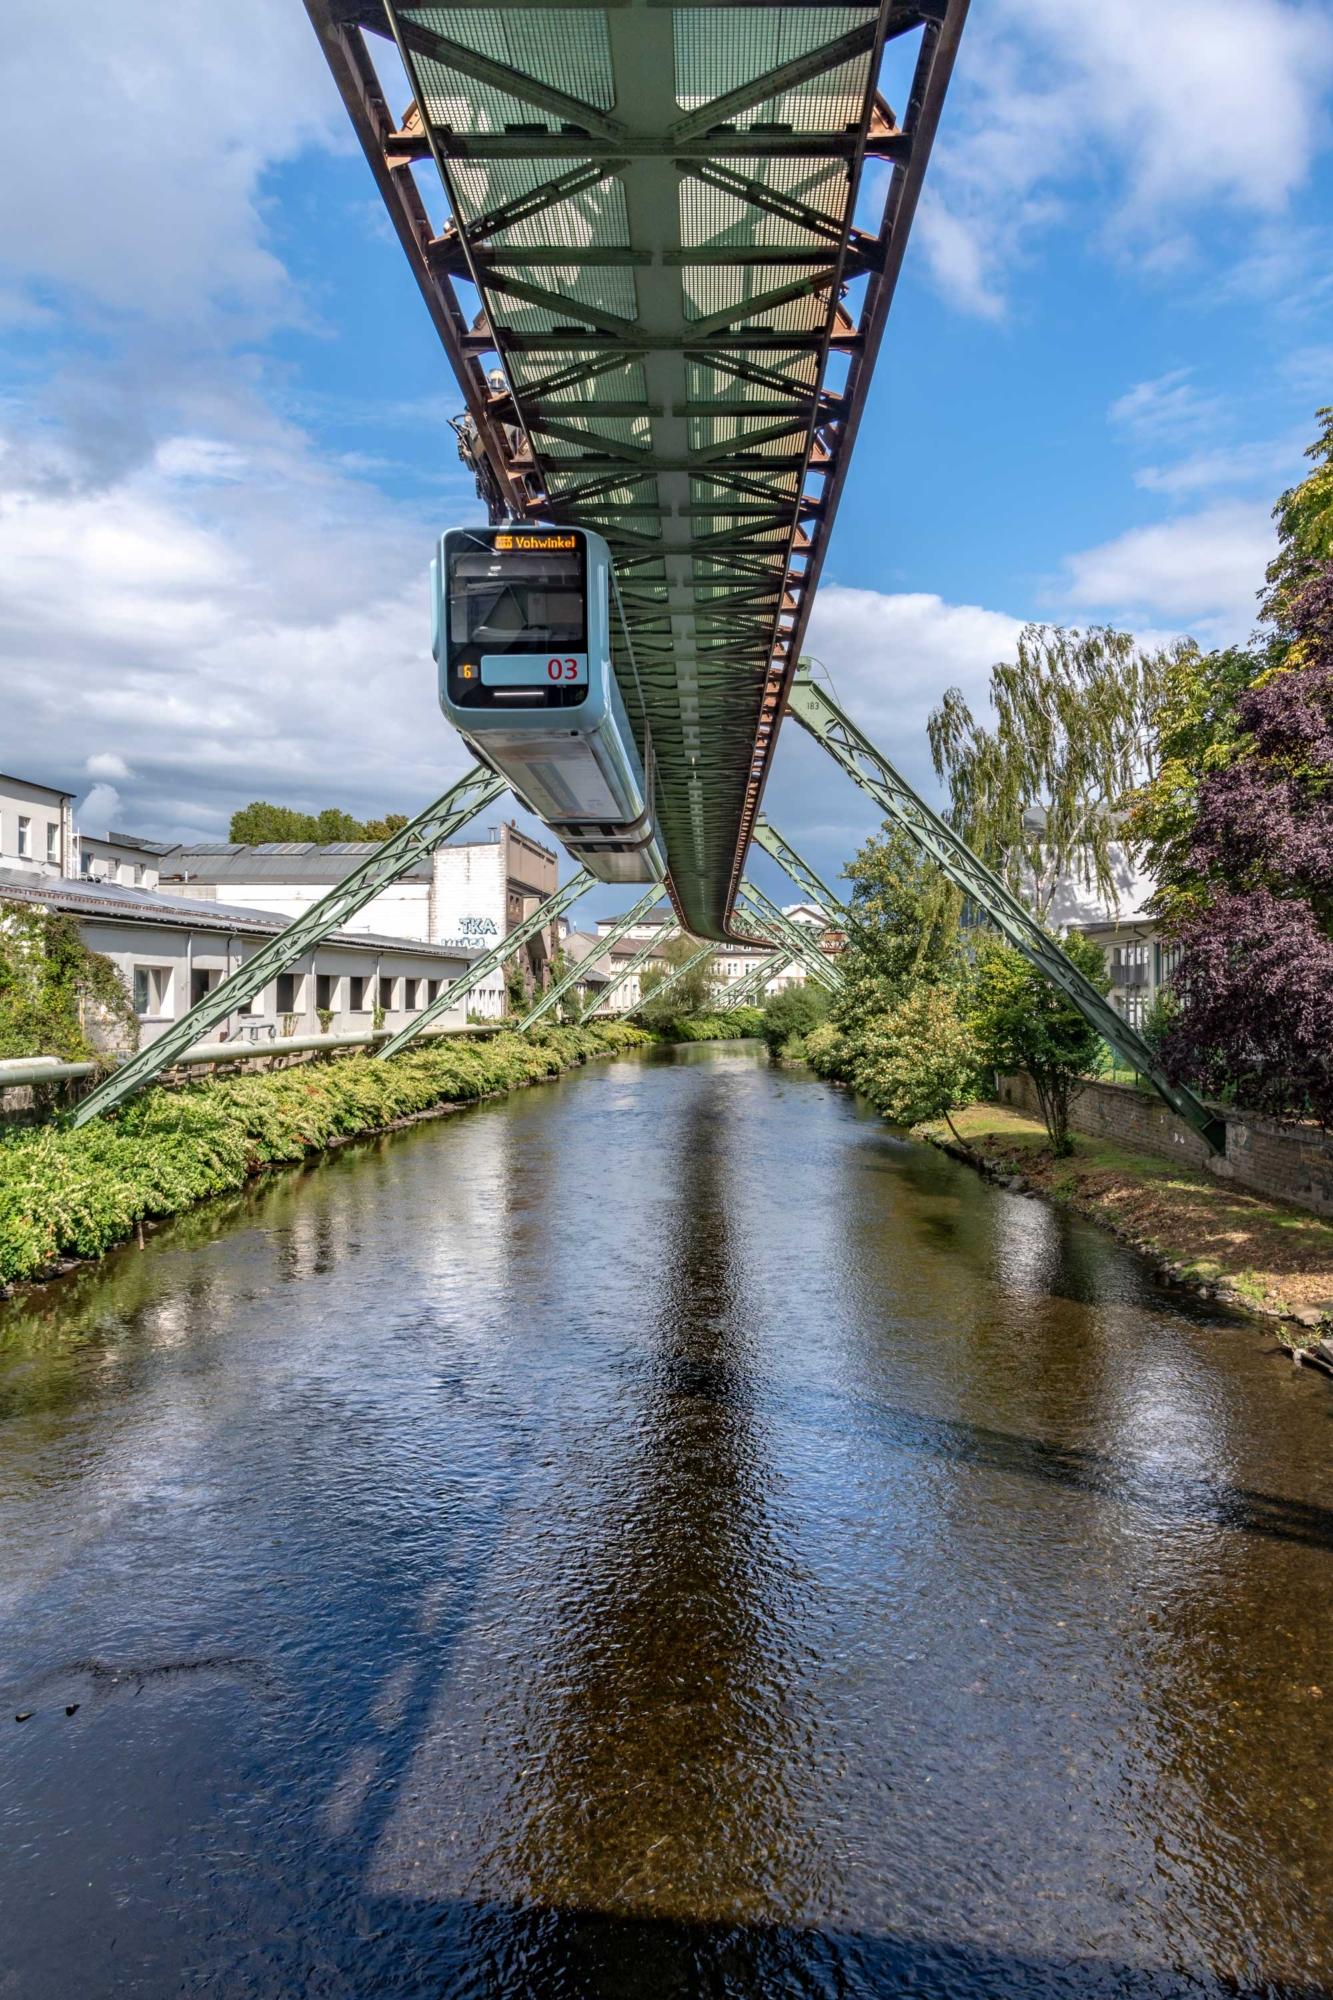 Wuppertal Schwebebahn Monorail, Germany 190905wc859635